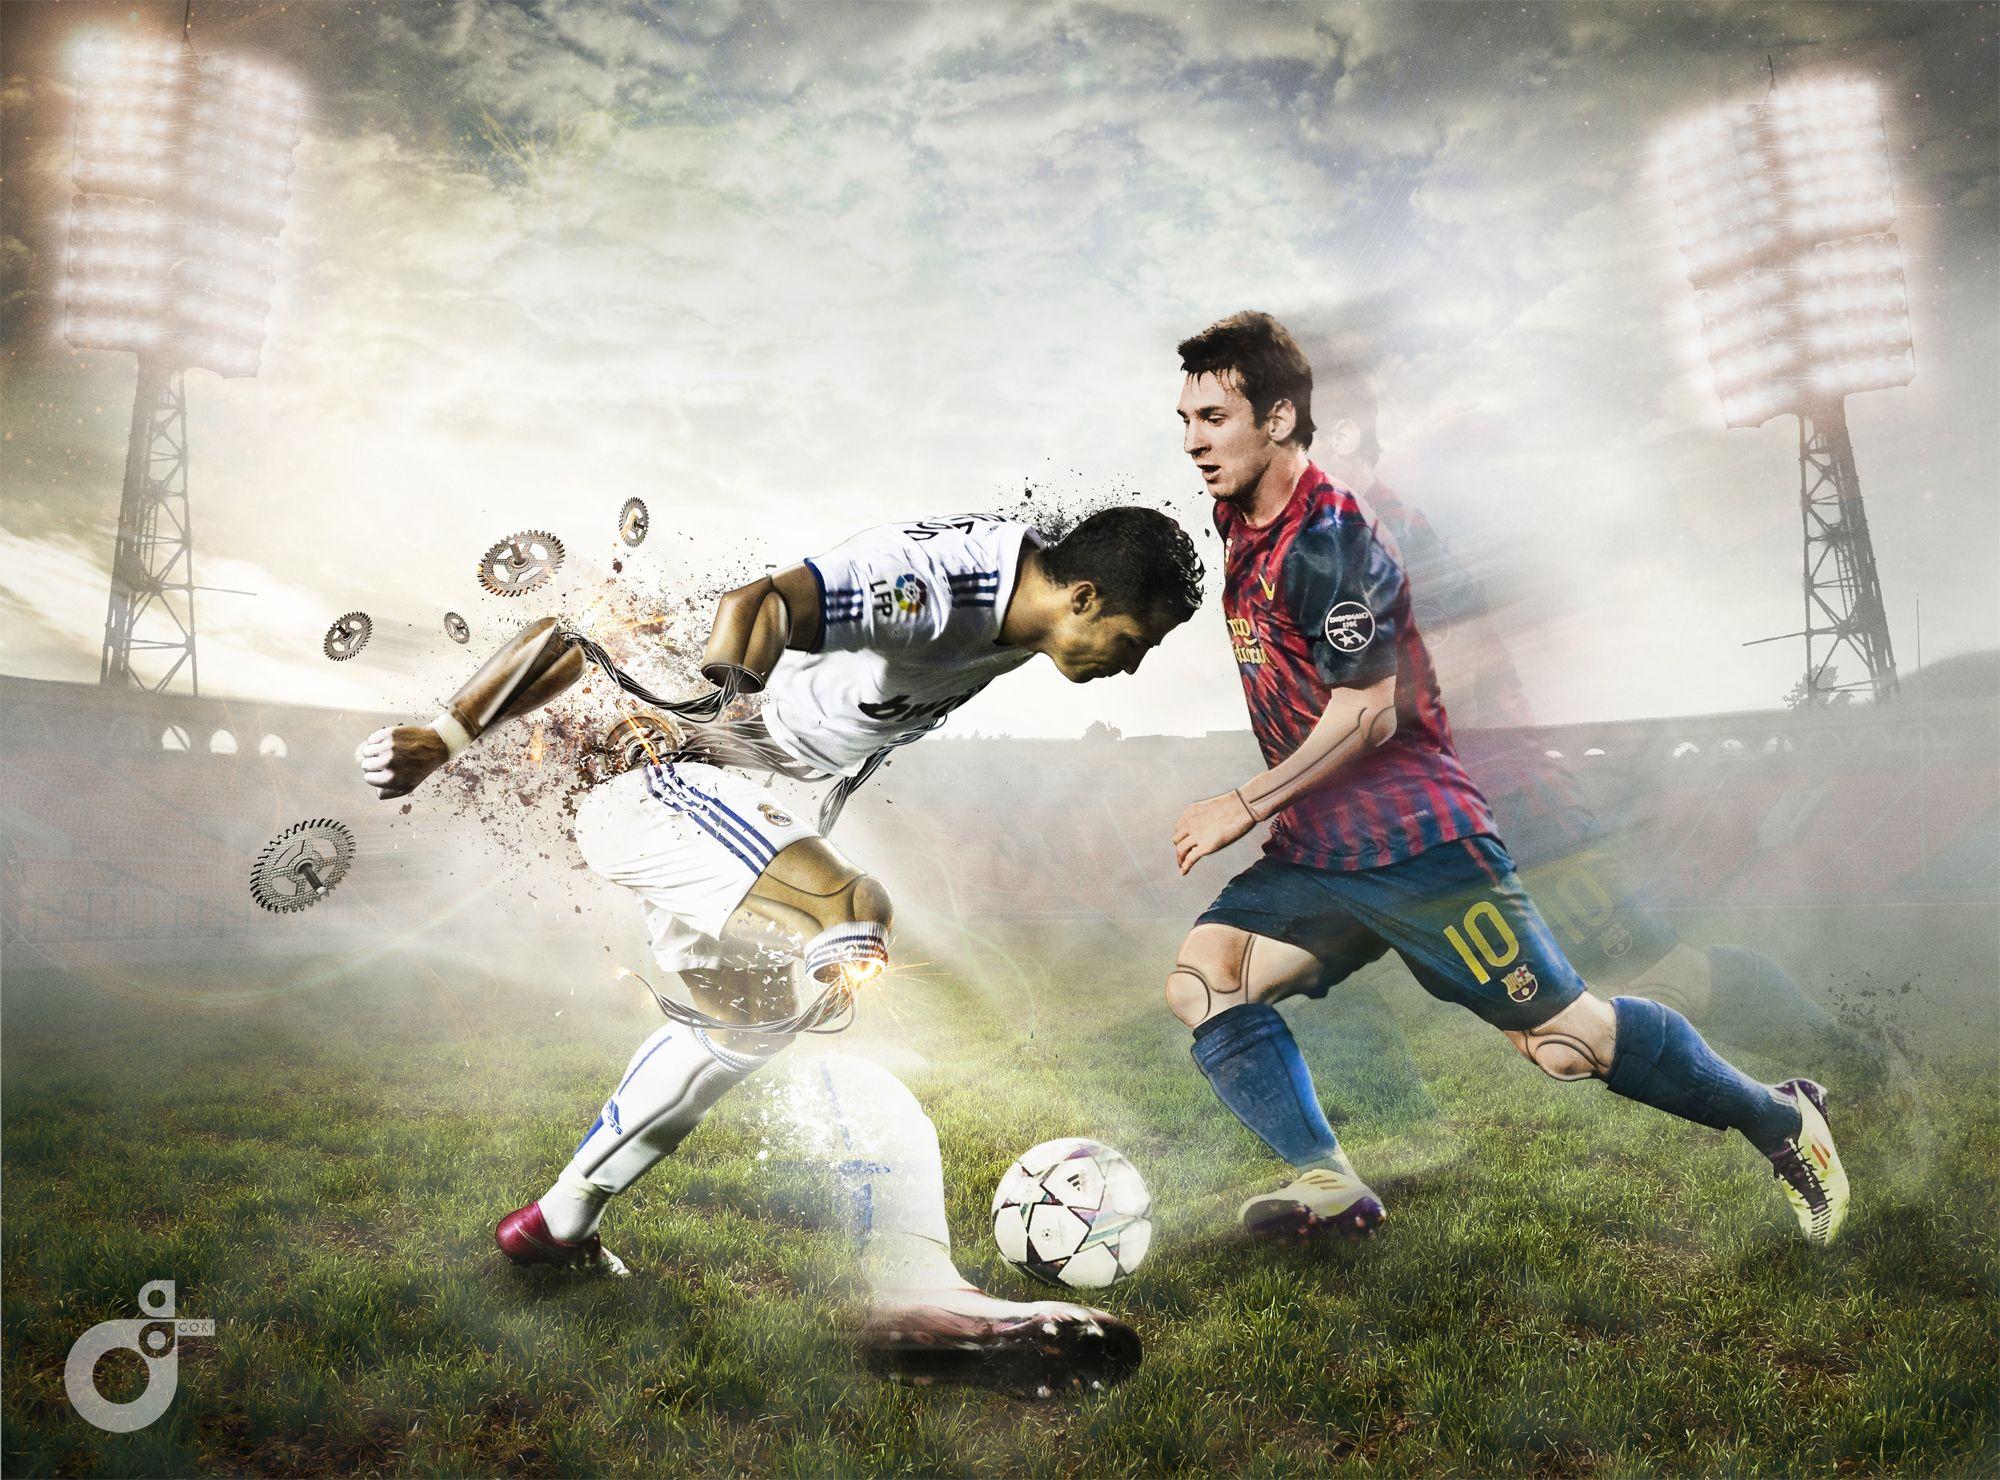 Leo Messi vs Cristiano Ronaldo by eska1303 on deviantART | Messi vs, Messi, Messi  vs ronaldo